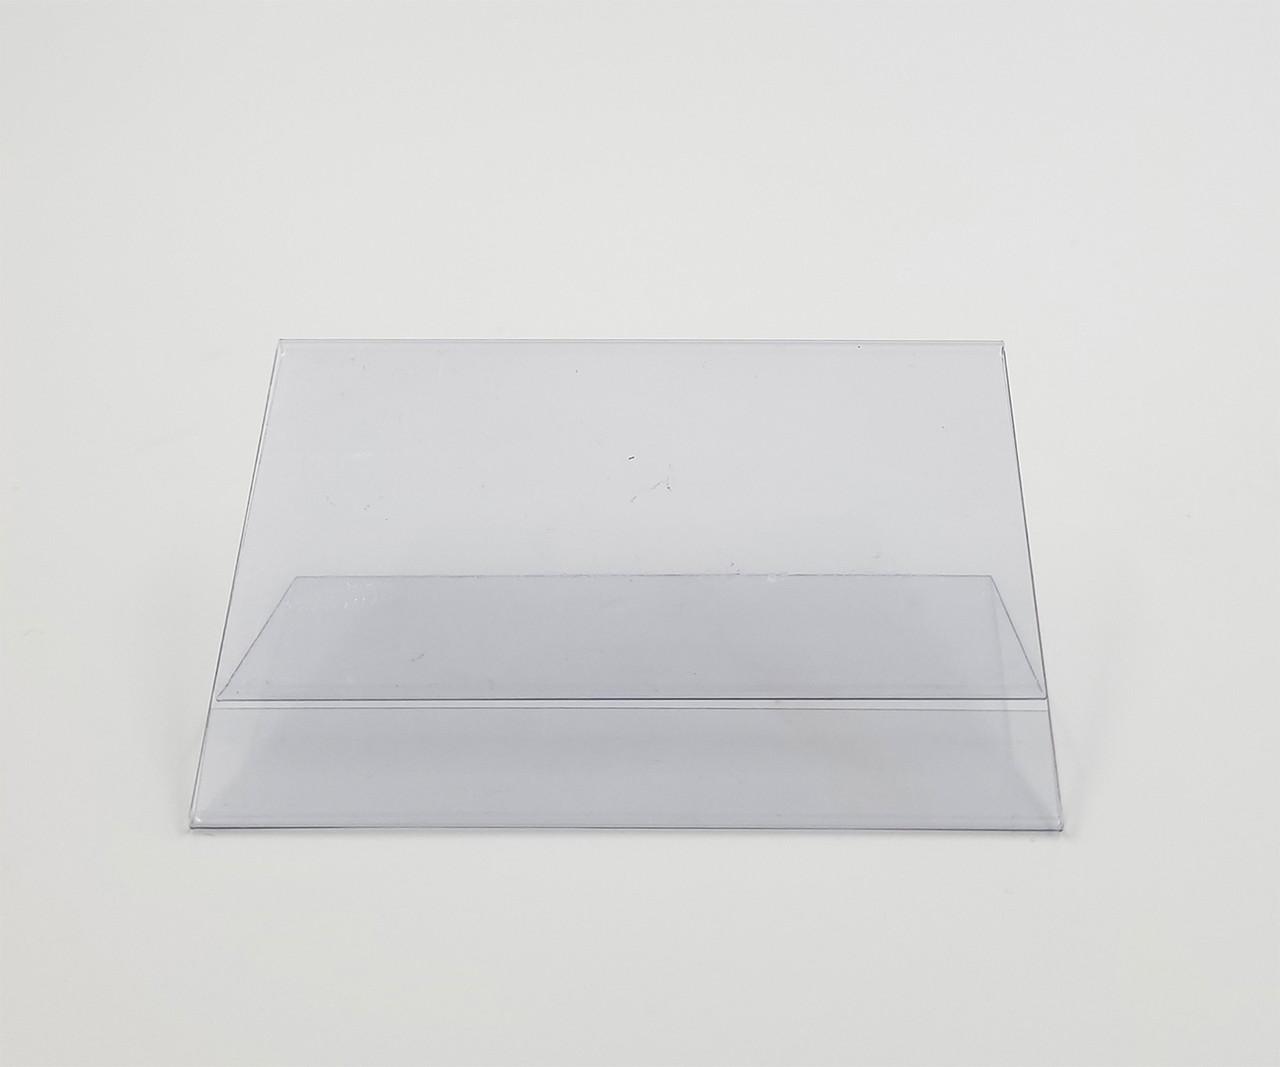 "PVC Countertop Sign Holder - 45° Slant Back - 3.5""W x 2.5""H"